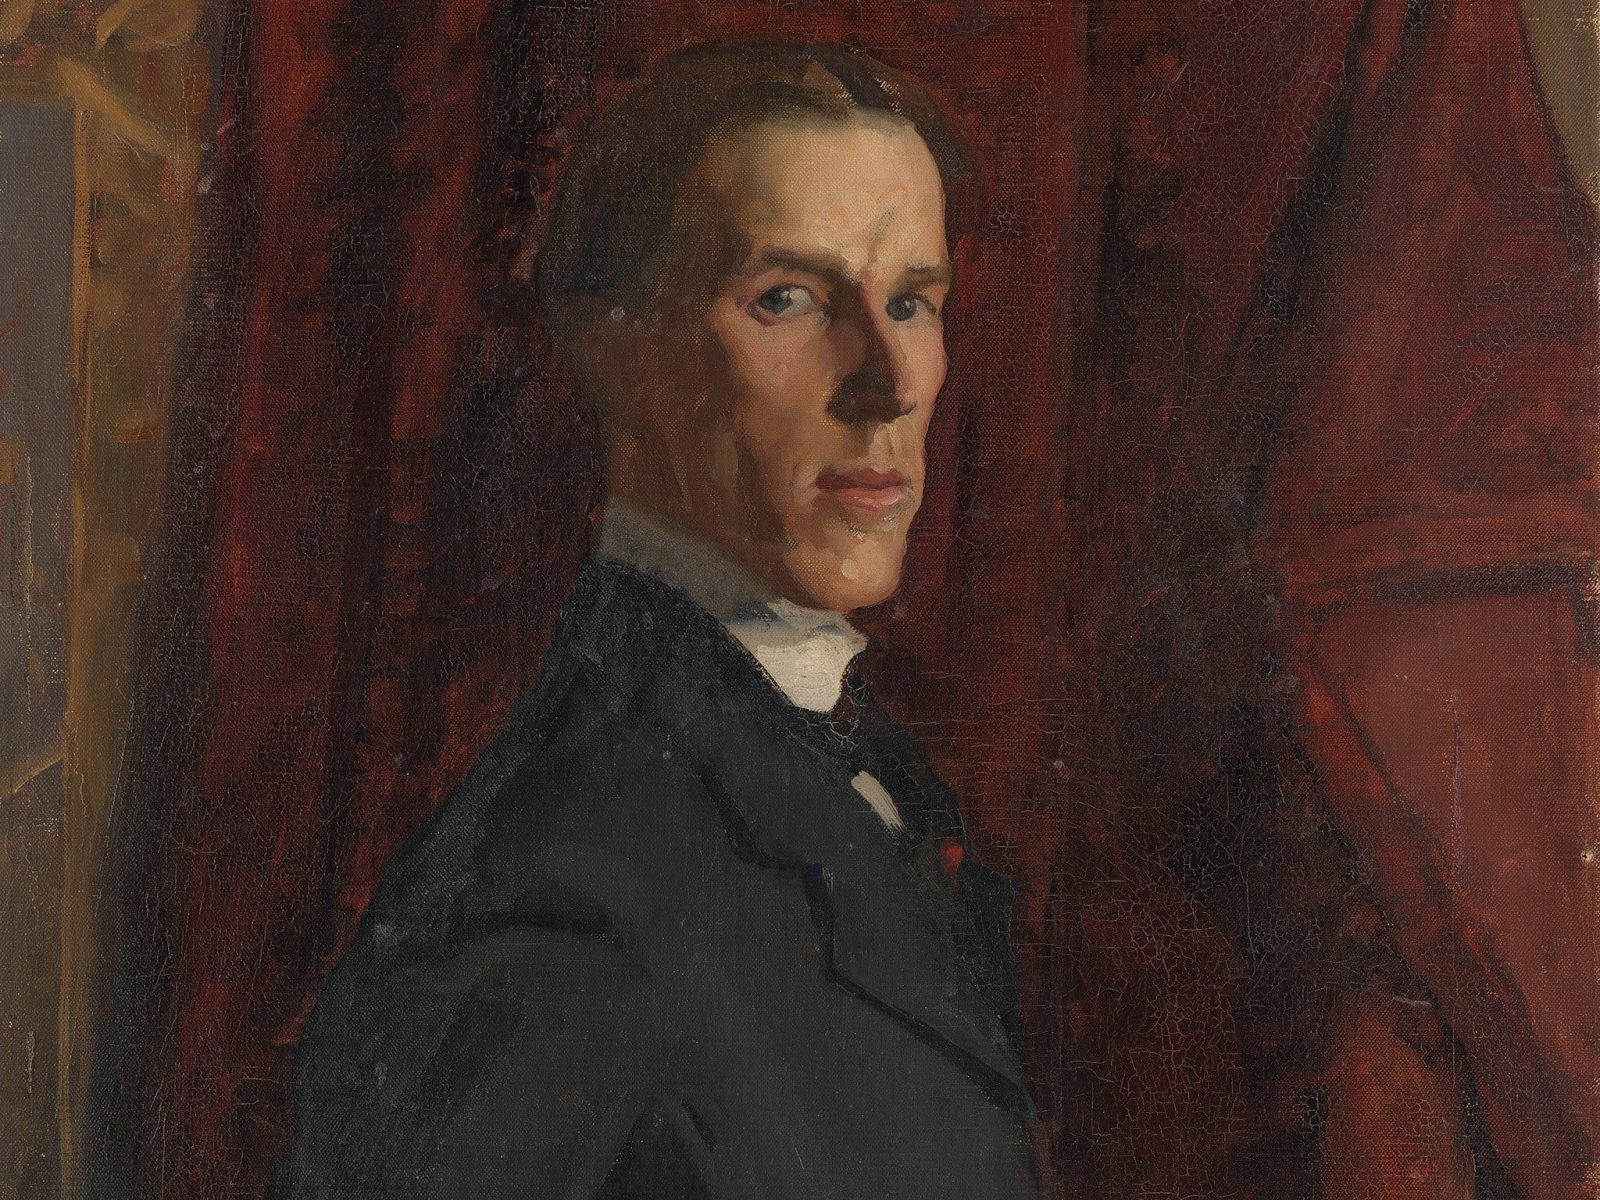 Hugh Ramsay Self-portrait c 1902